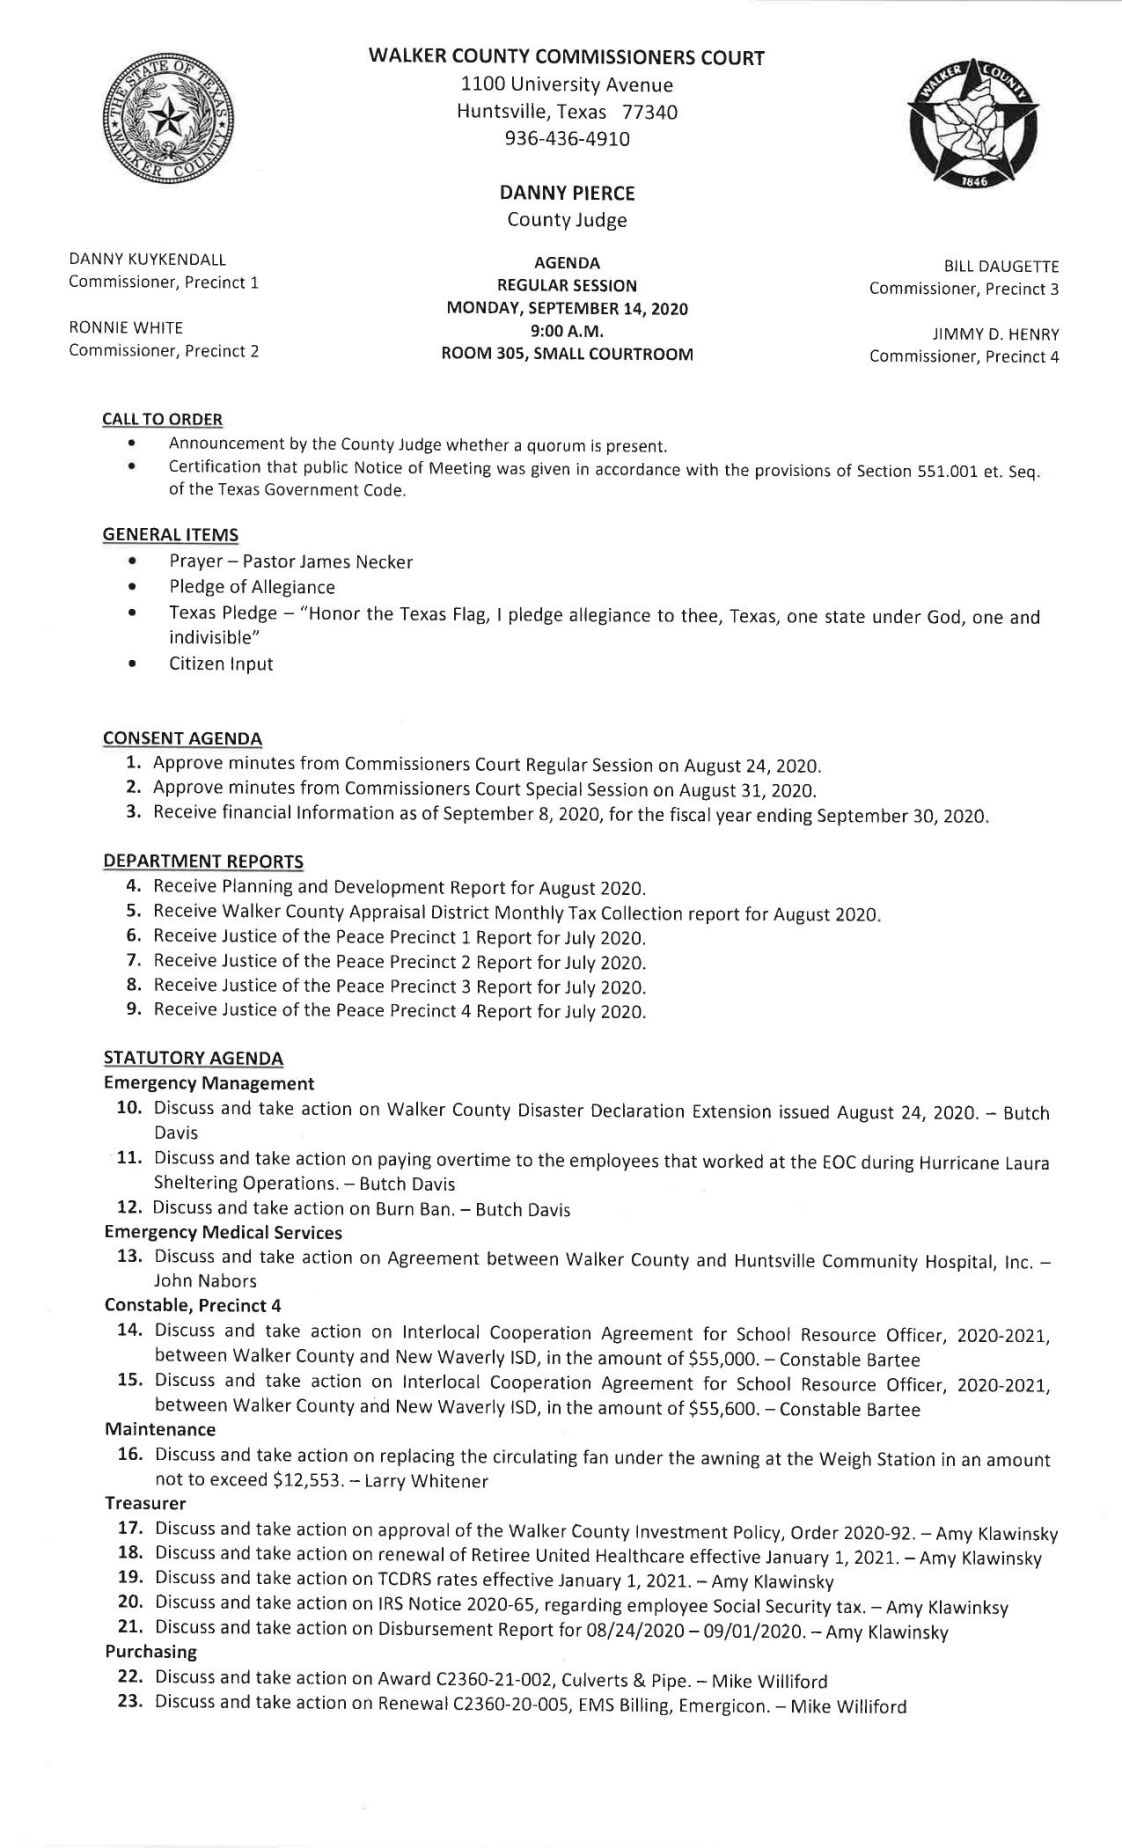 Commissioners Court Agenda _September 14 2020.pdf